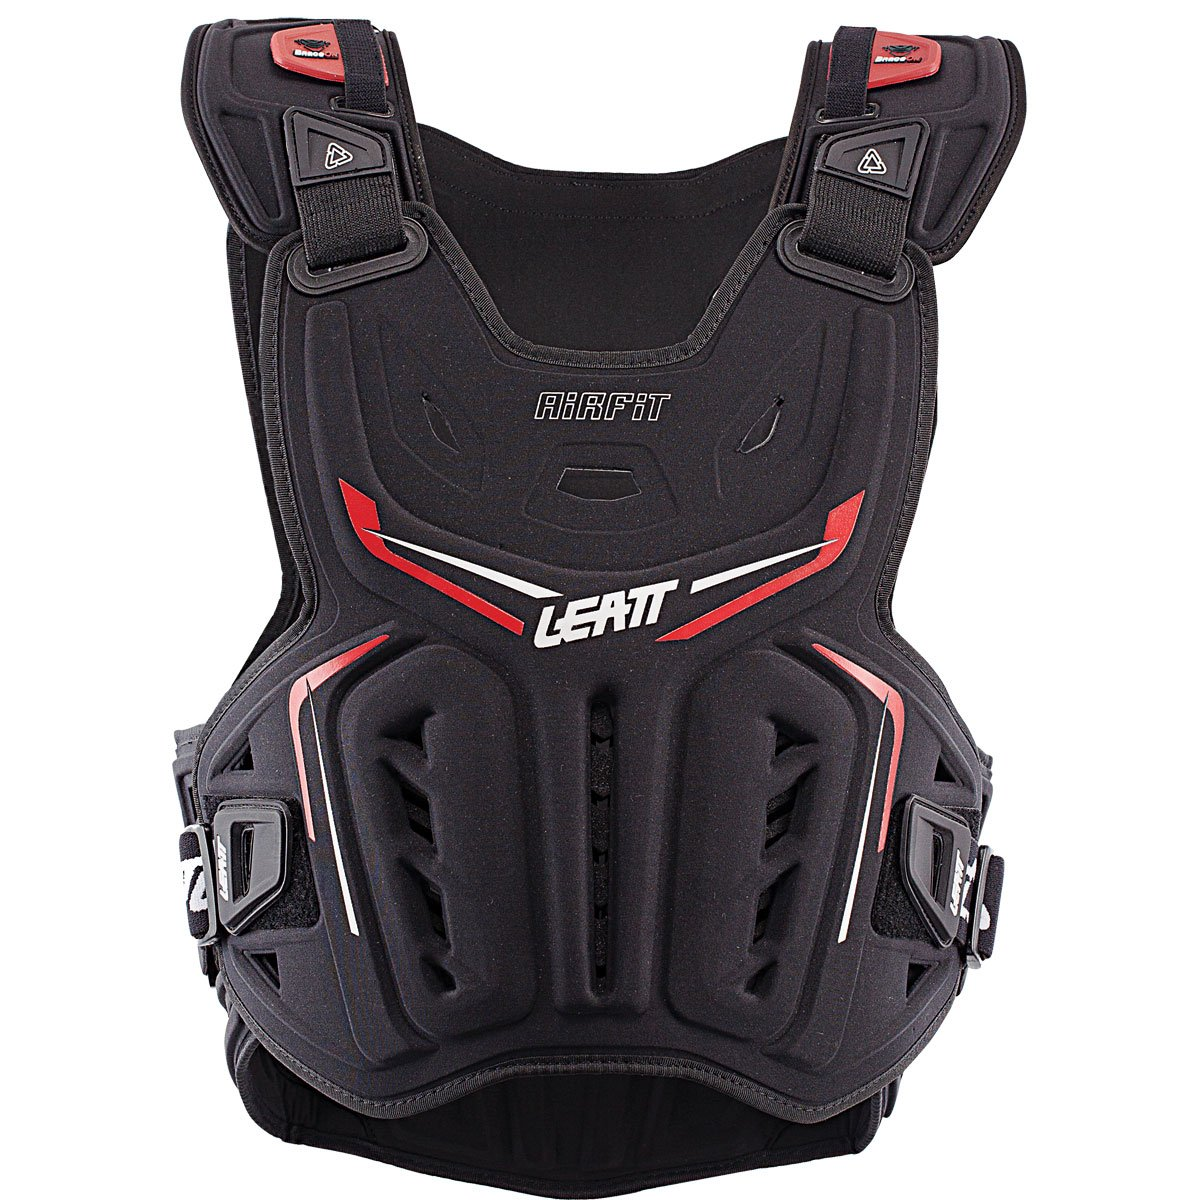 Leatt Black XX-Large Chest Protector,5 Pack